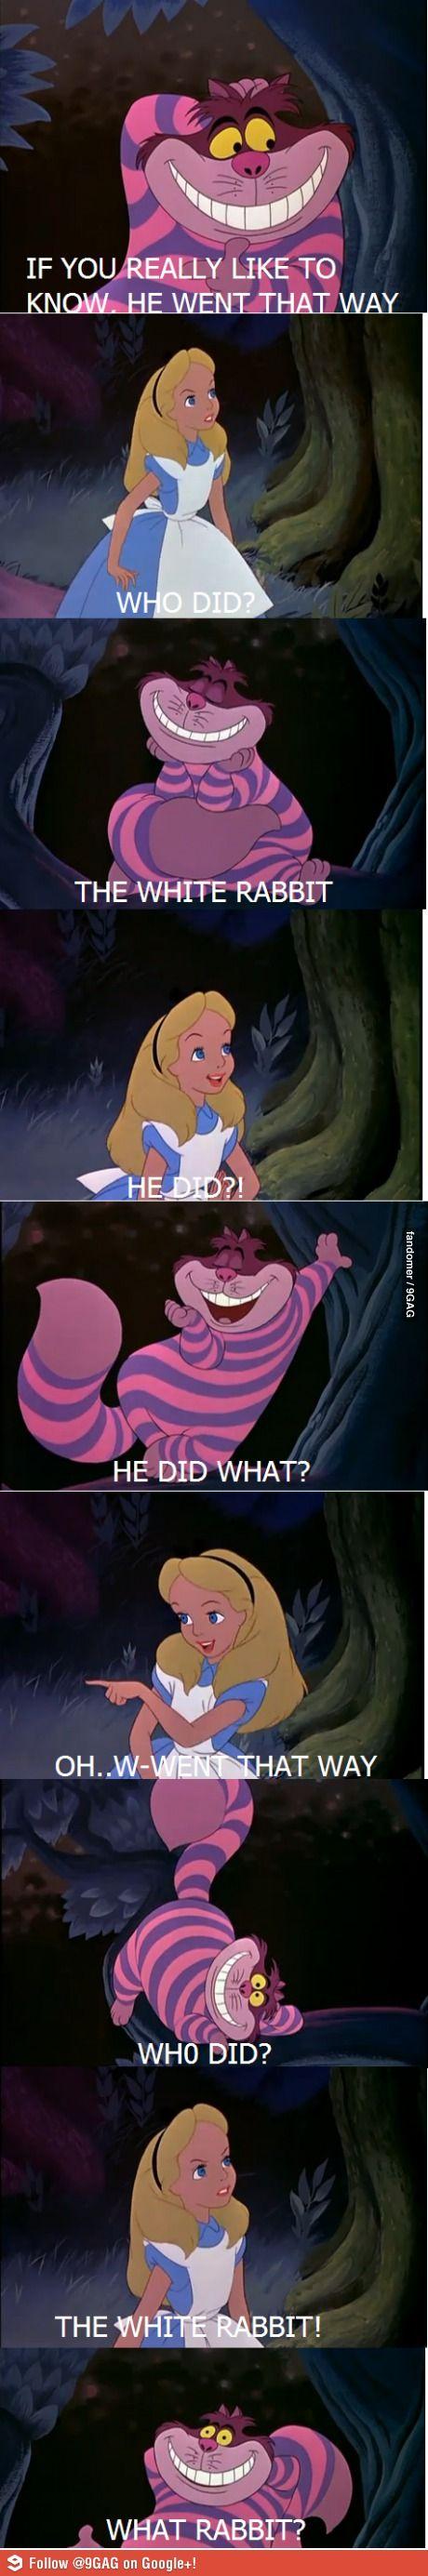 Disney's Original Troll - this is my favorite part (: